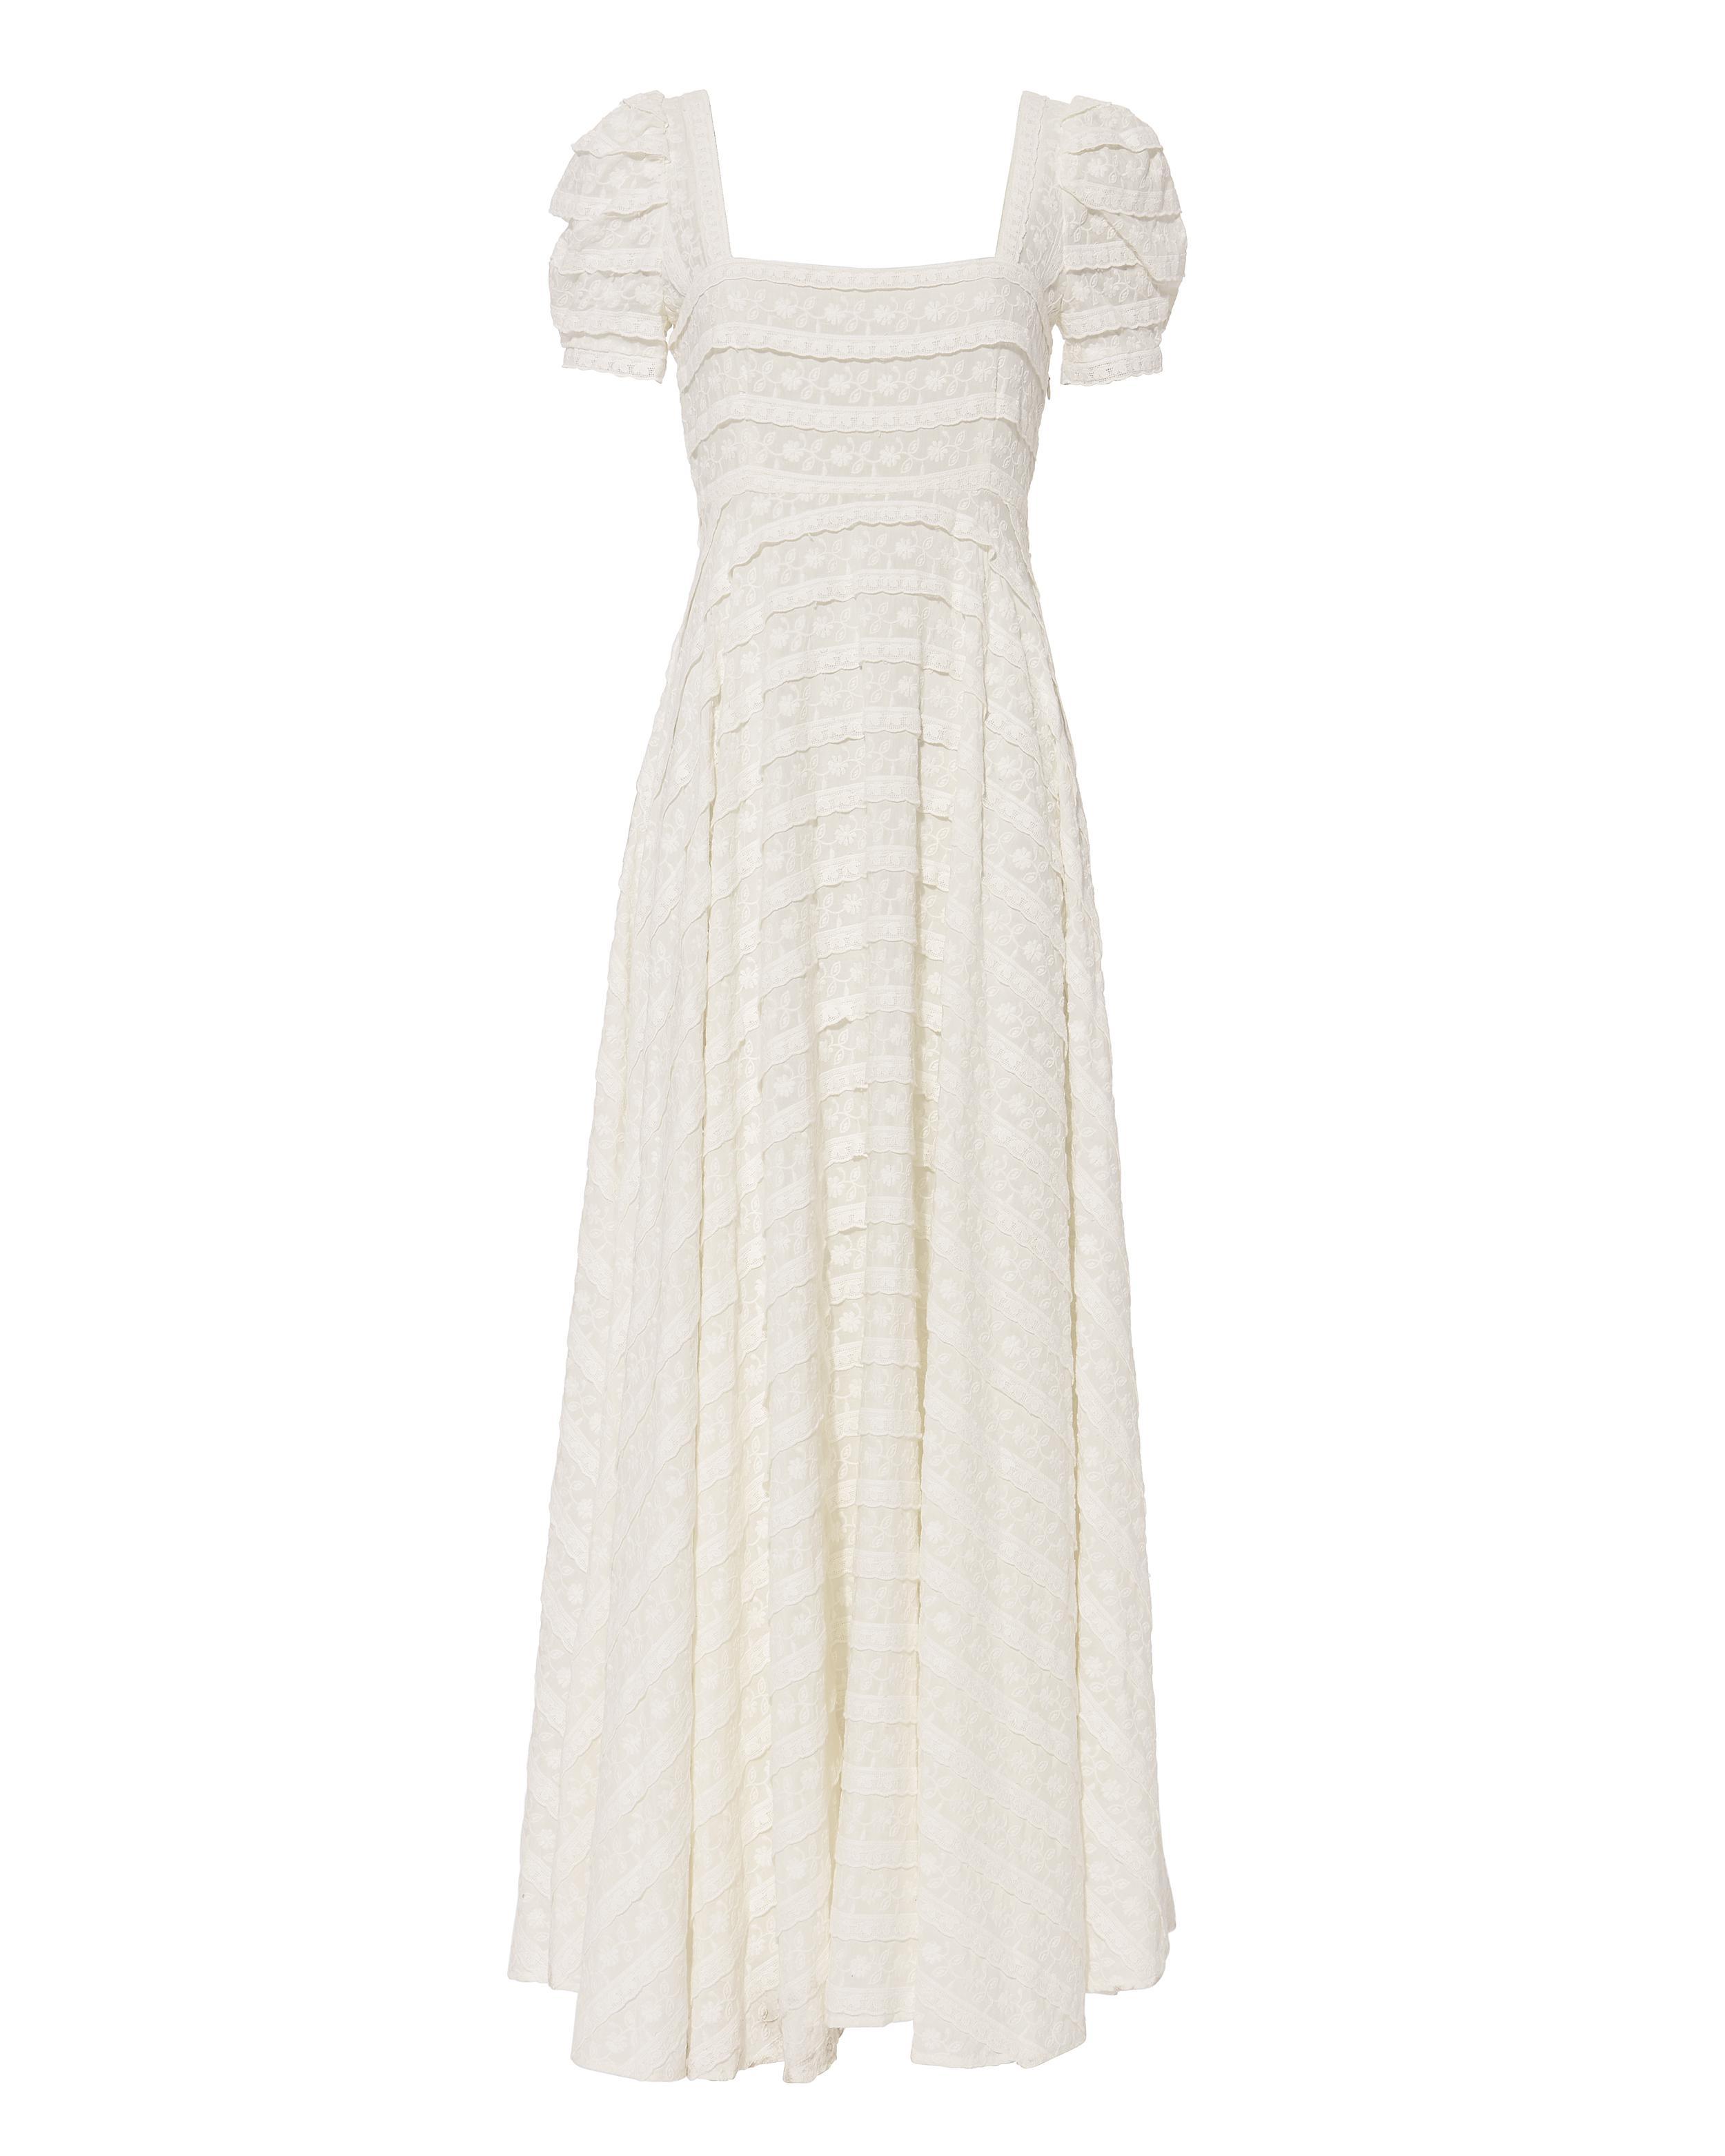 2a5cc2a3a1b34 LoveShackFancy Ryan Maxi Dress in White - Lyst